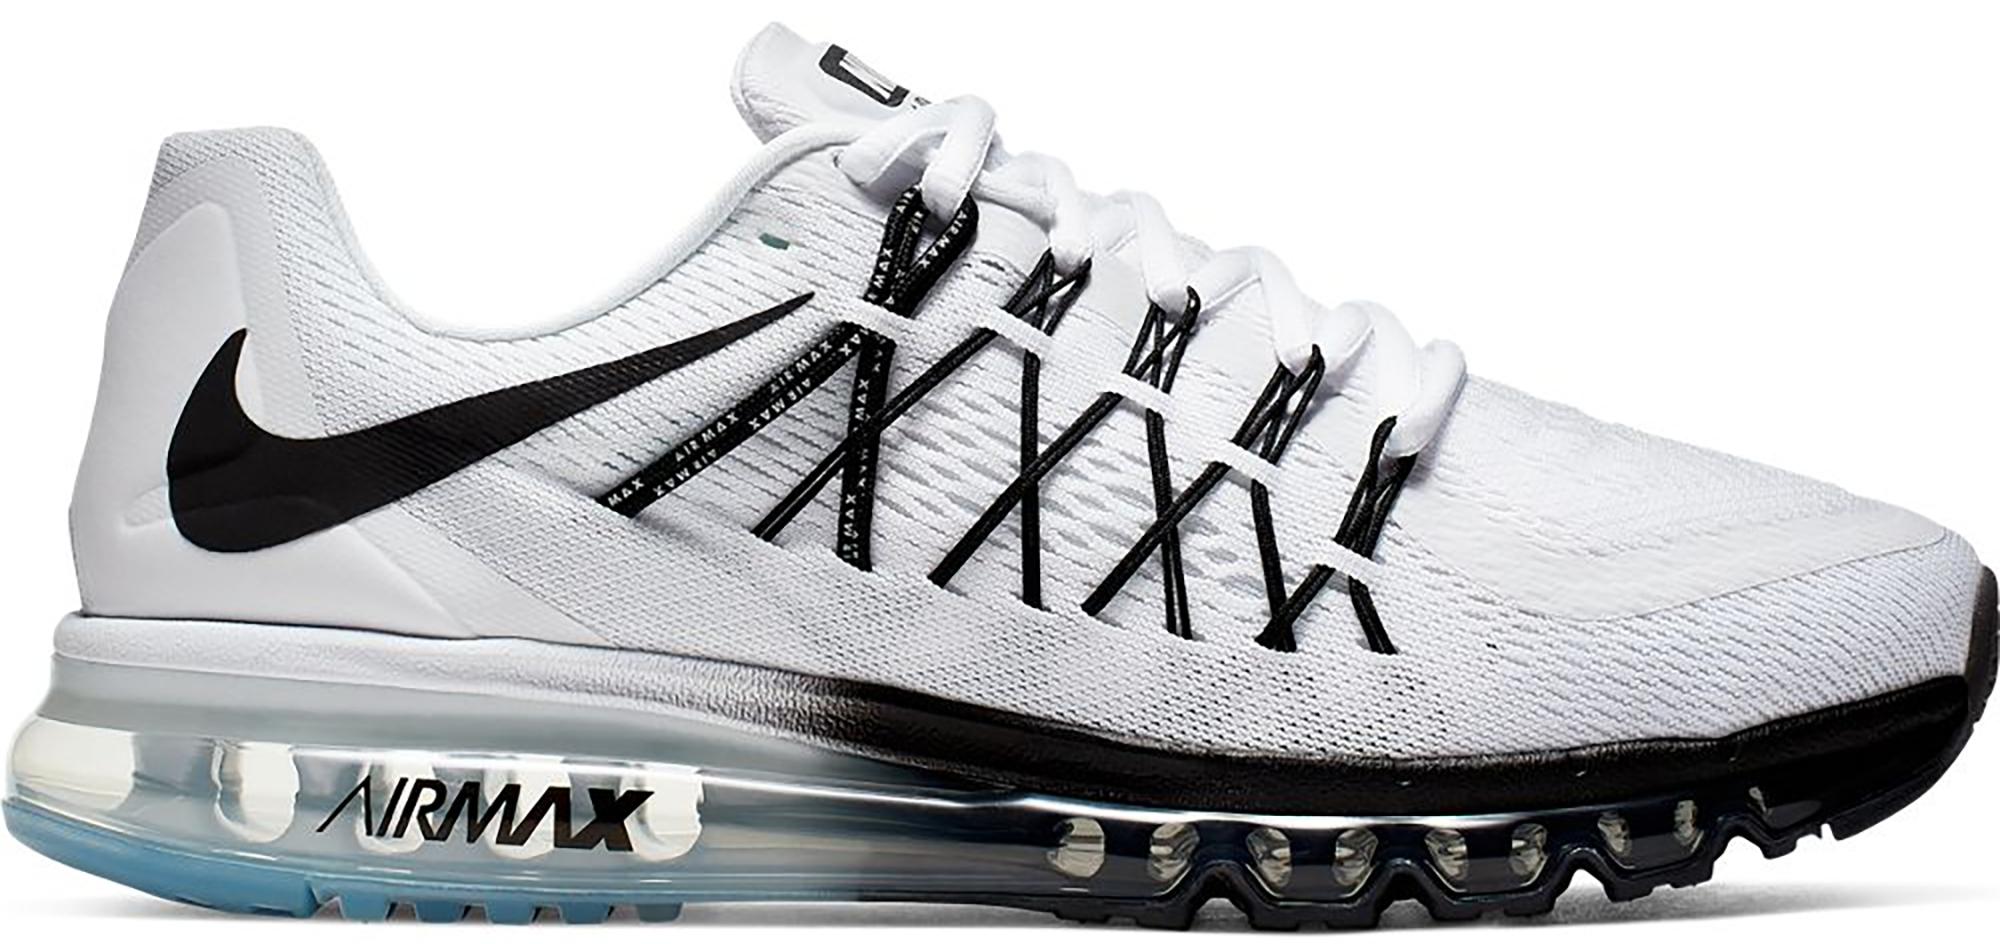 Nike Air Max 2015 White Black - CD7625-100